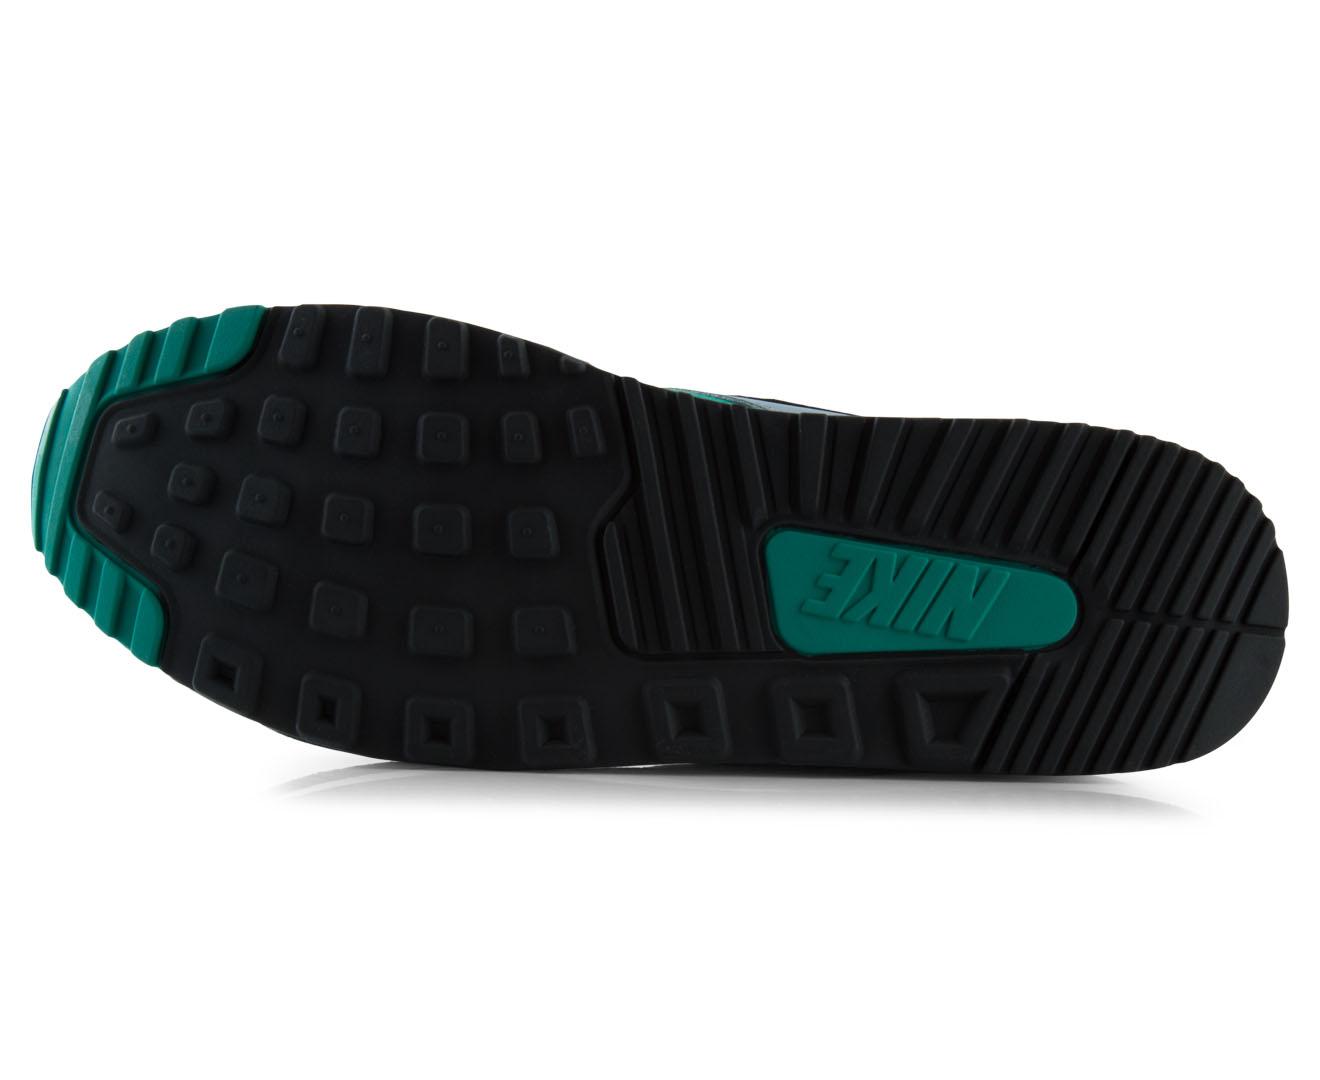 73c39785d6 Nike Men's Air Max Light Essential Shoe - White/Black/Mystic Green |  Catch.com.au